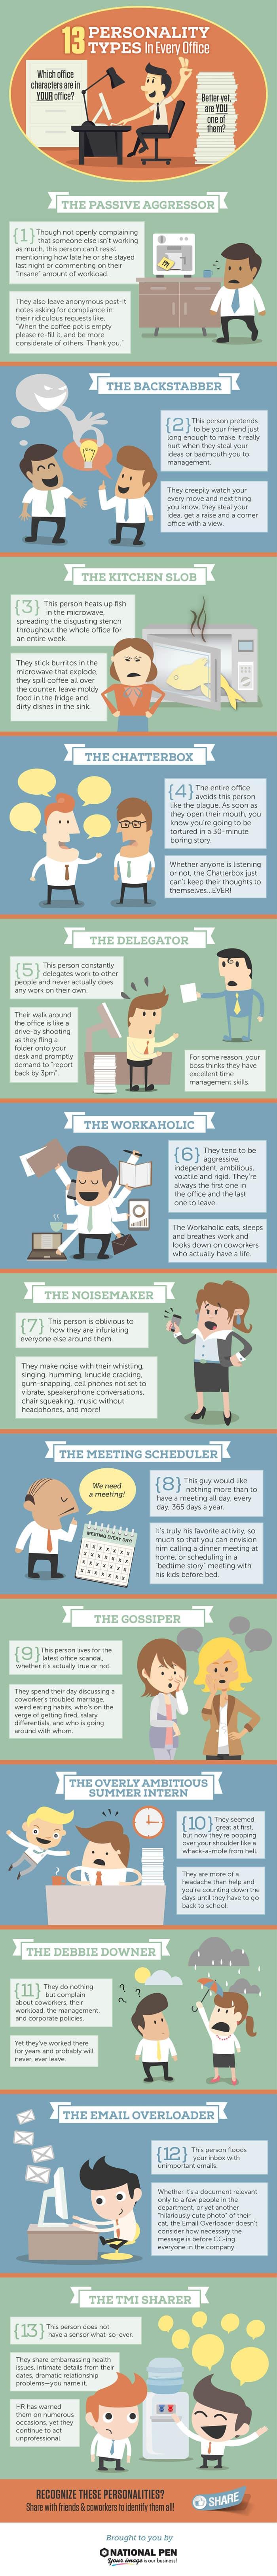 OfficePersonalitiesInfographic